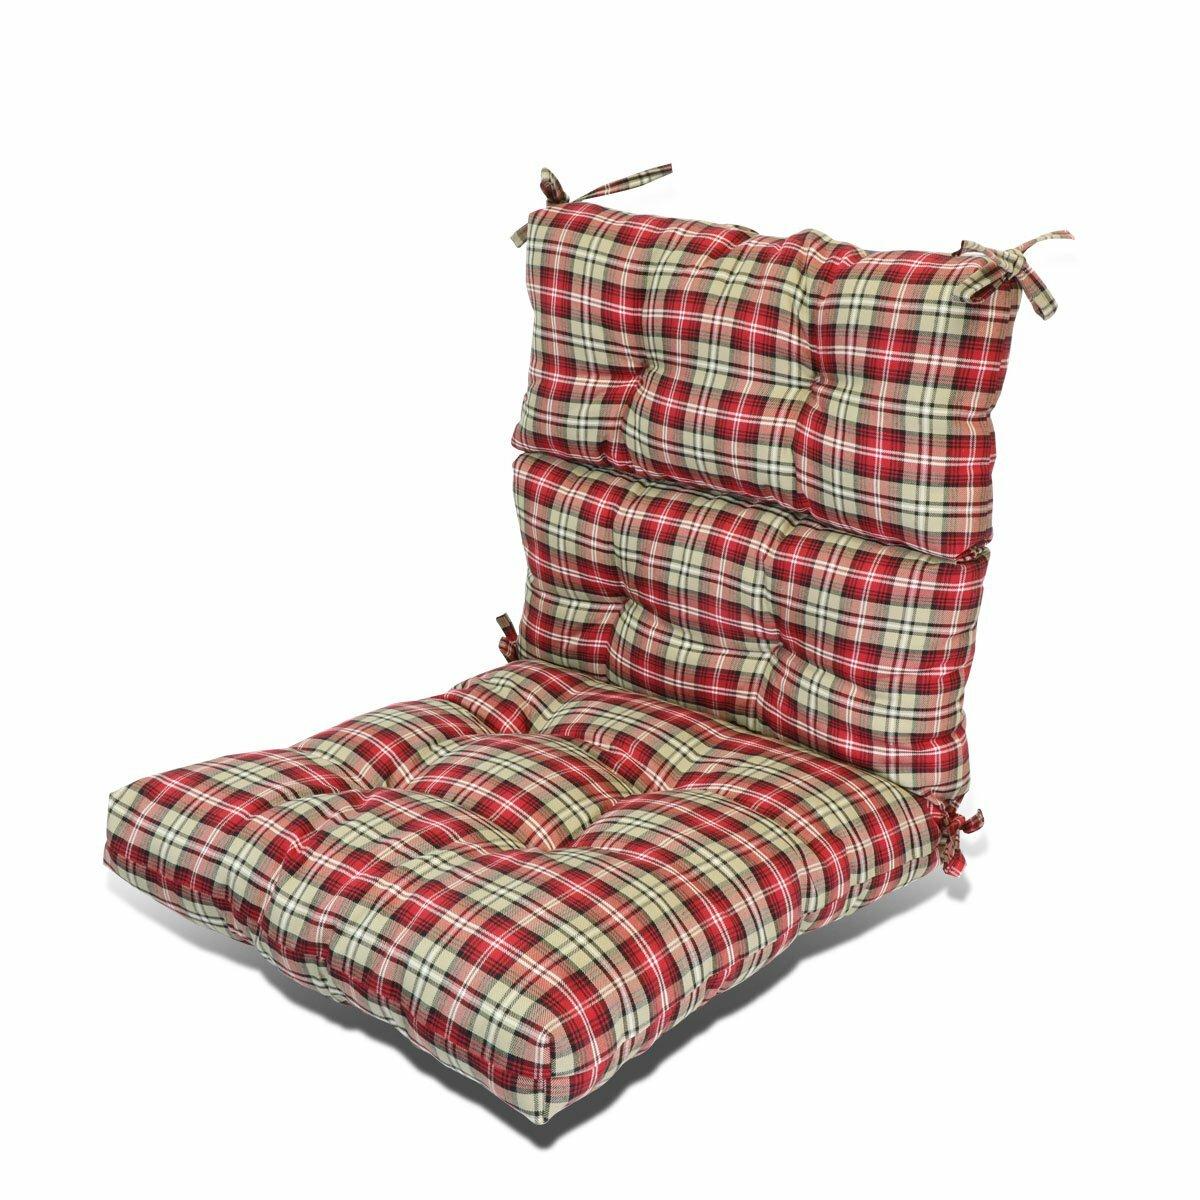 Indoor Outdoor Rocking Chair Cushion